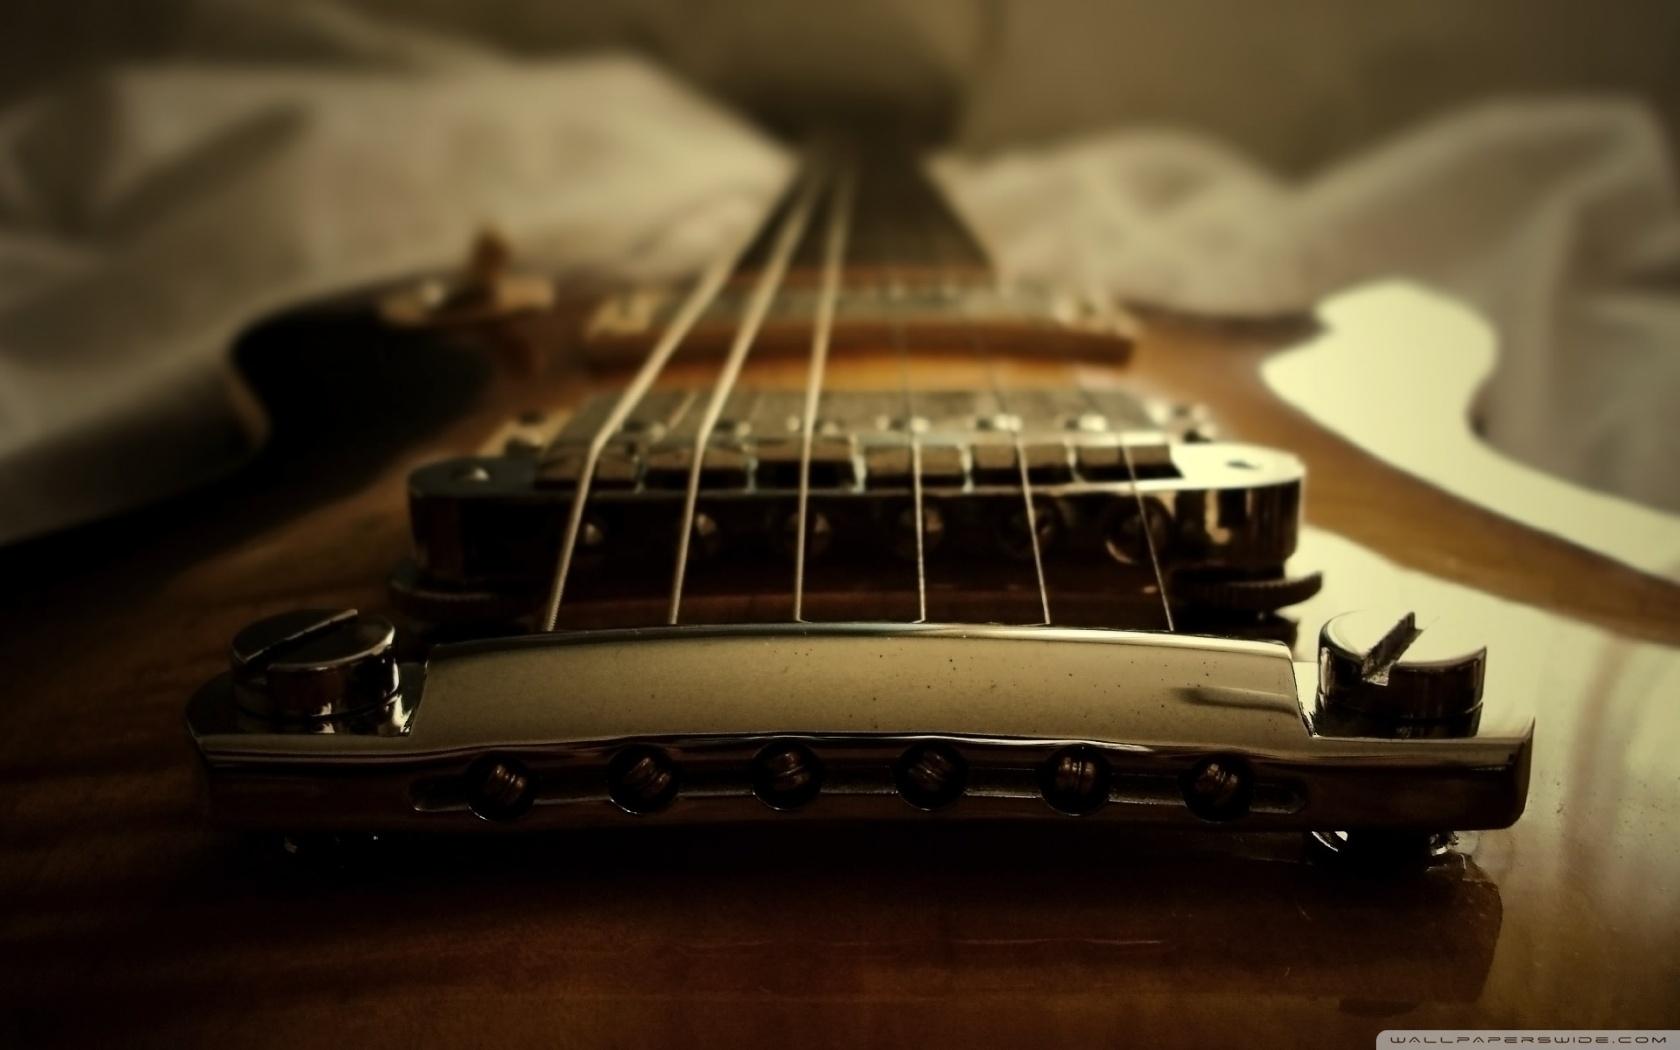 gibson les paul guitar ❤ 4k hd desktop wallpaper for 4k ultra hd tv